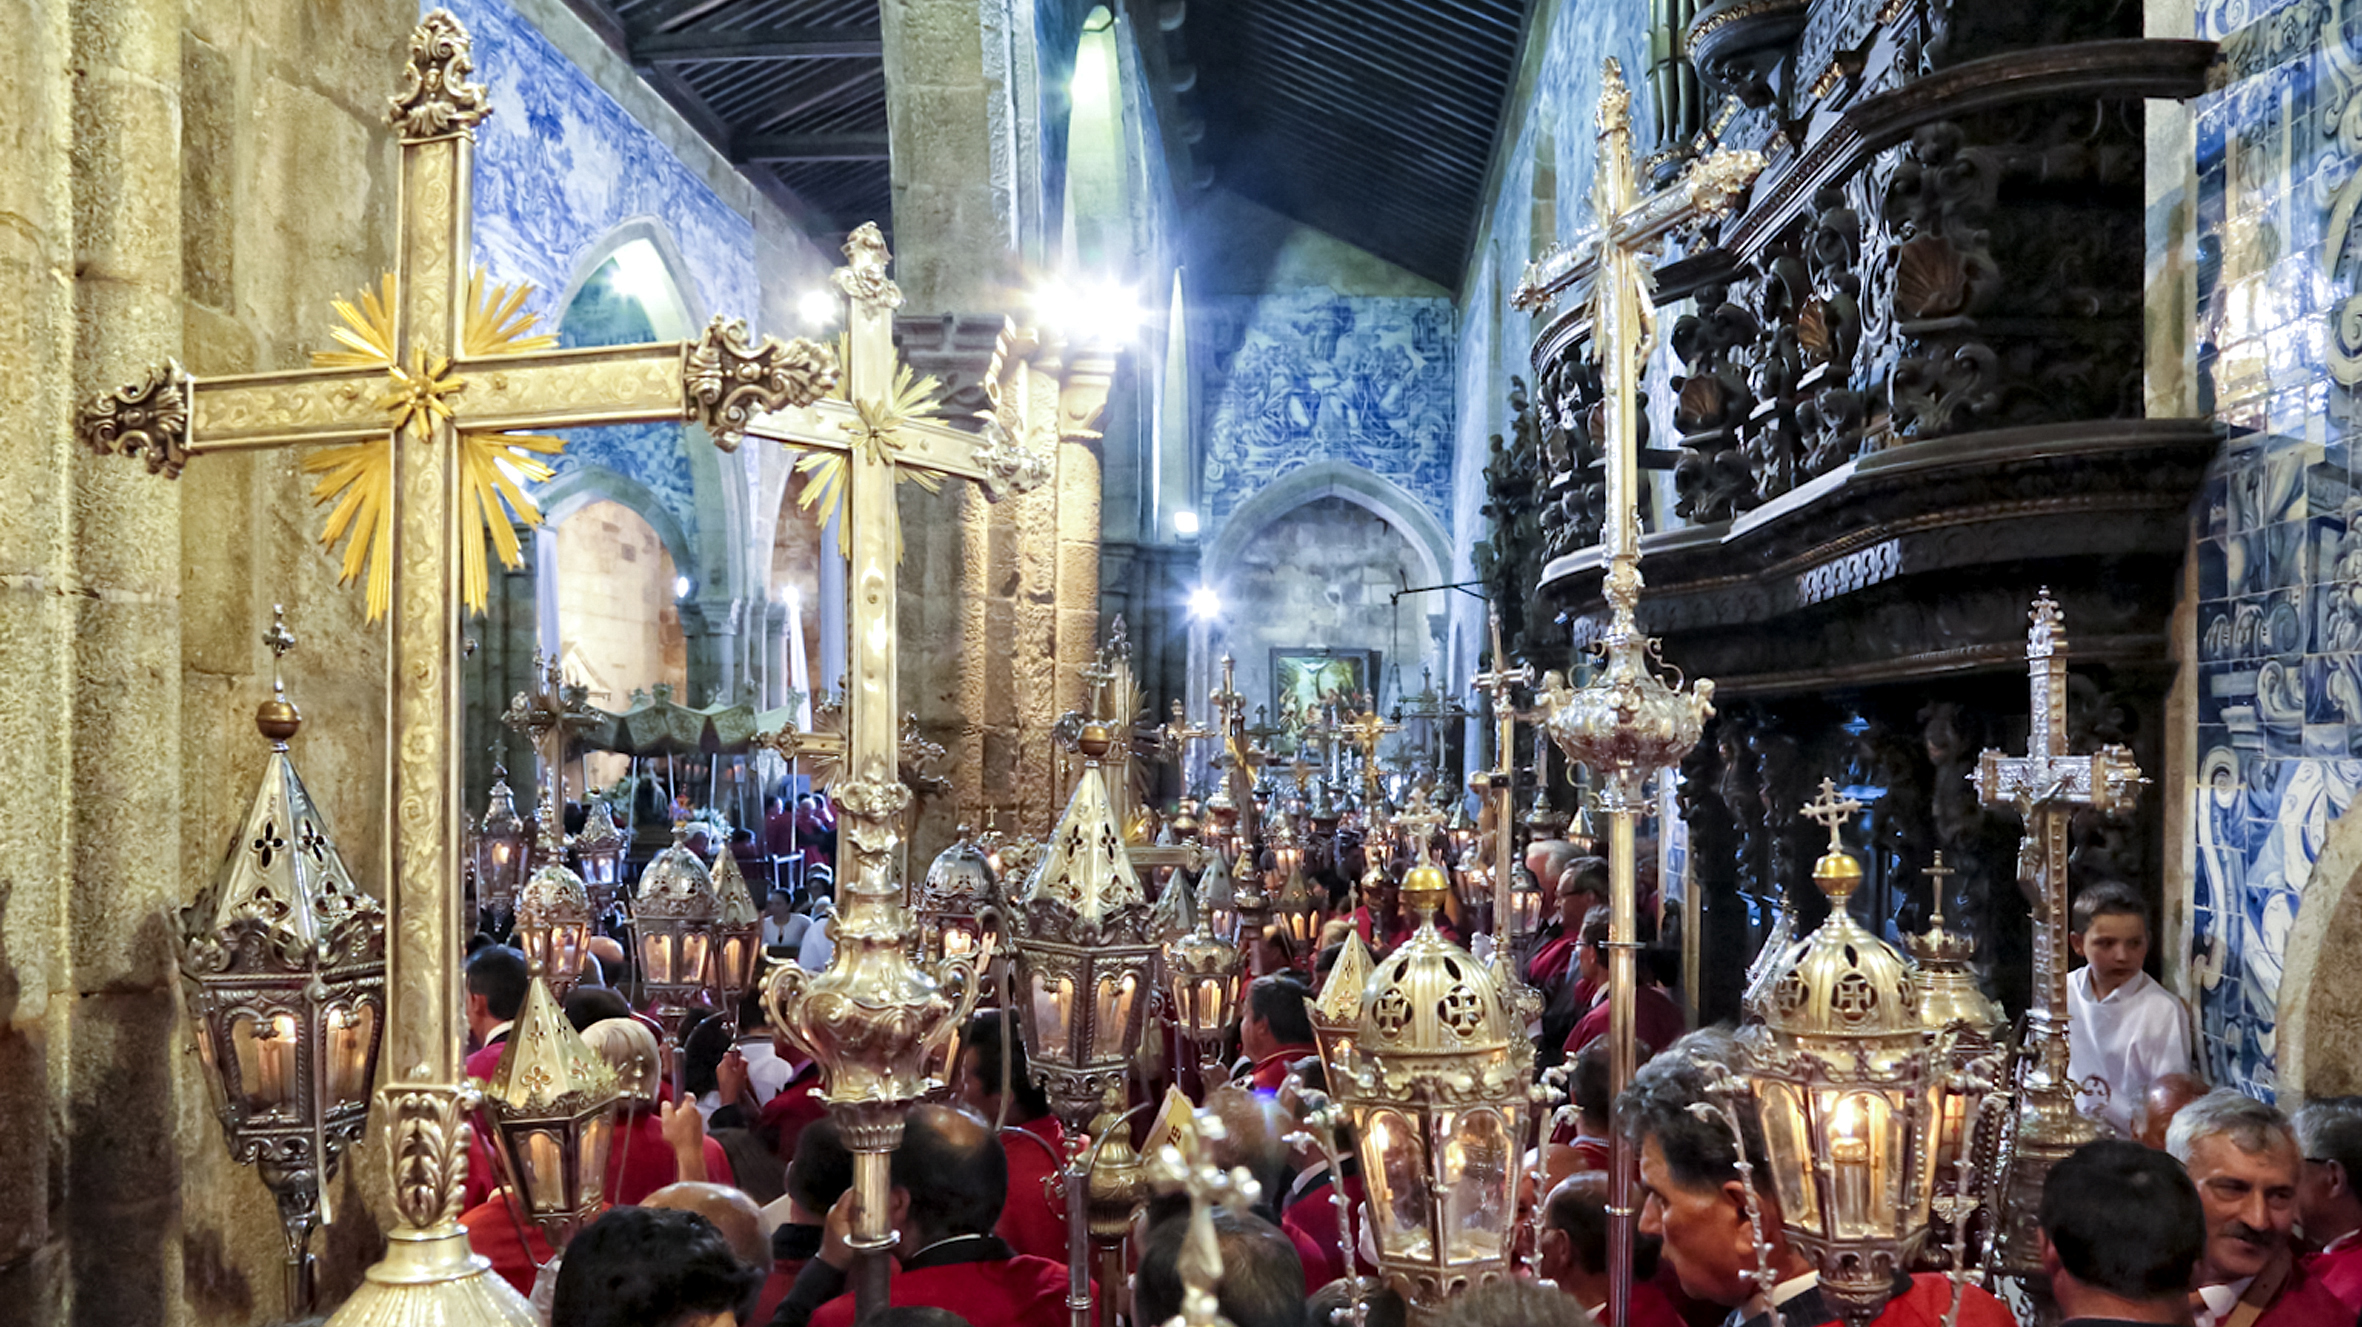 Festa das Cruzes